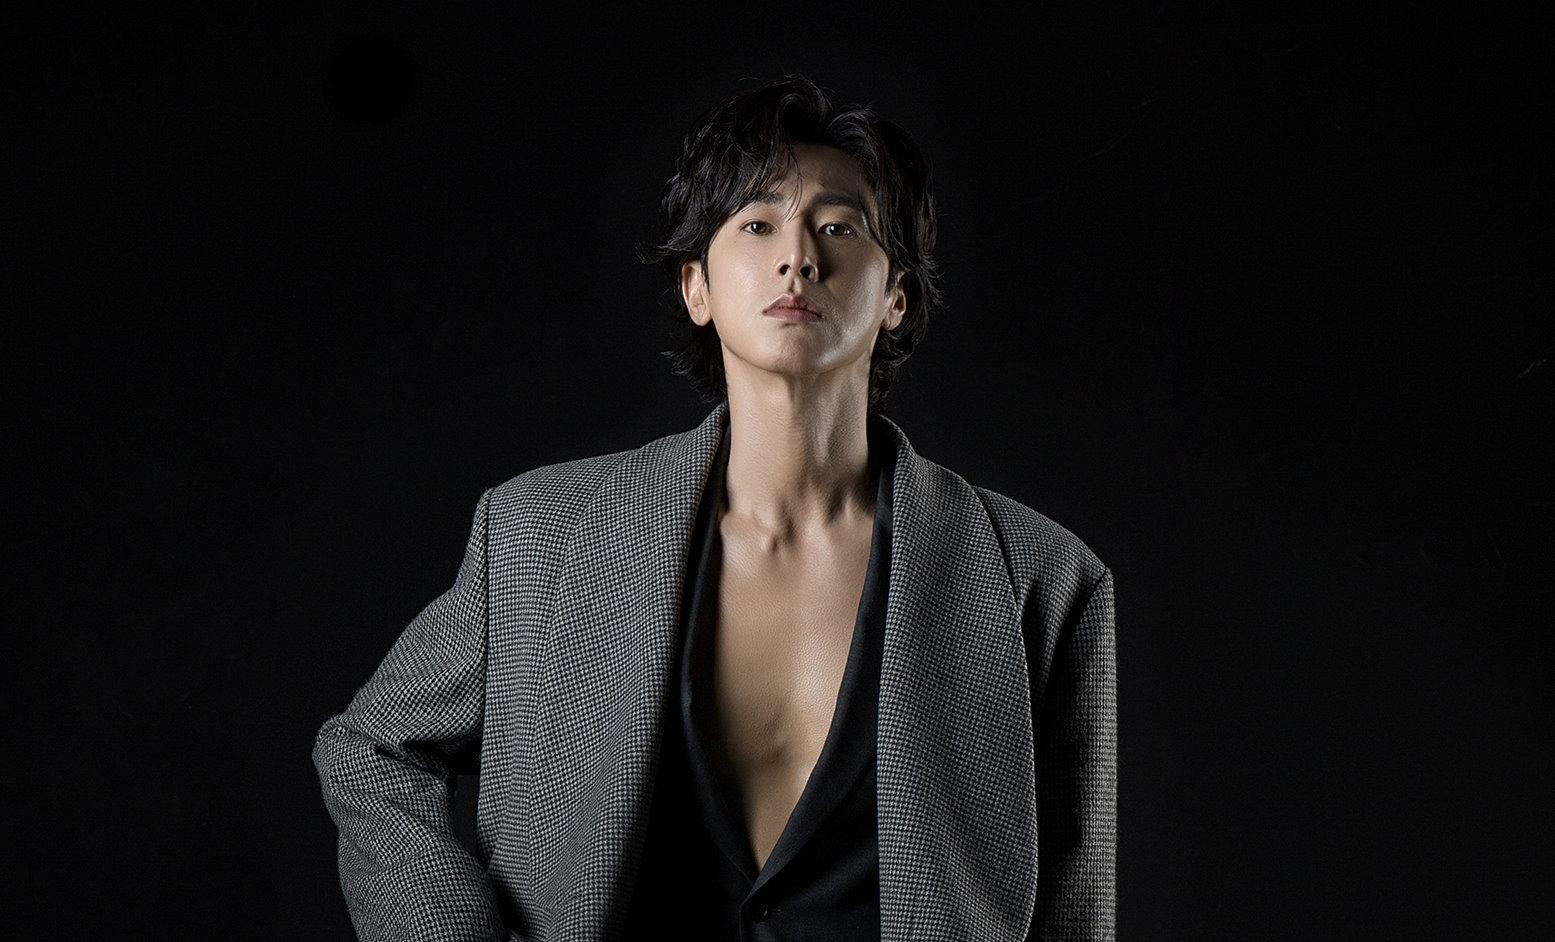 Kpop February 6